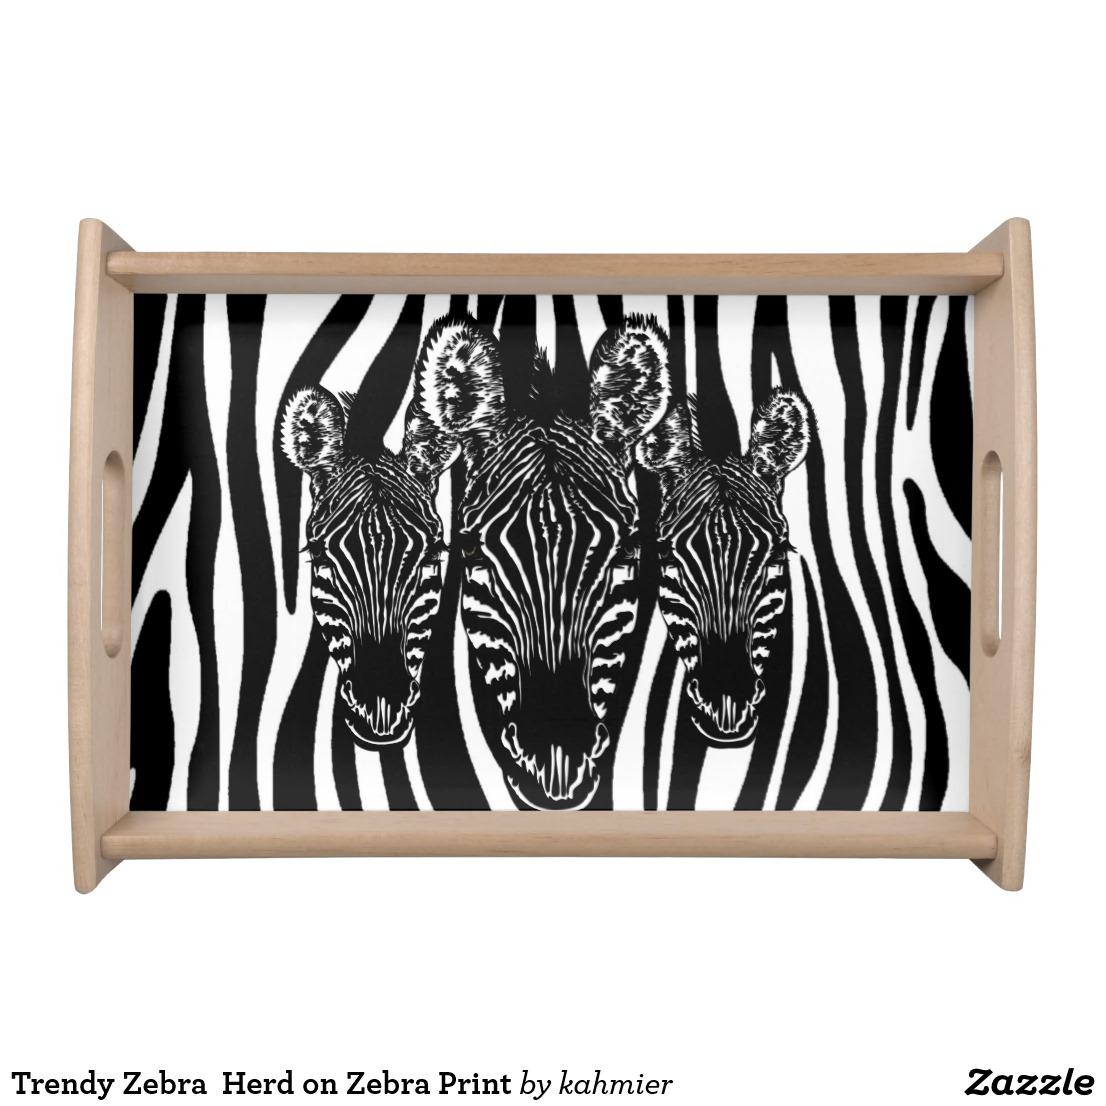 Trendy Zebra Herd on Zebra Print Serving Tray